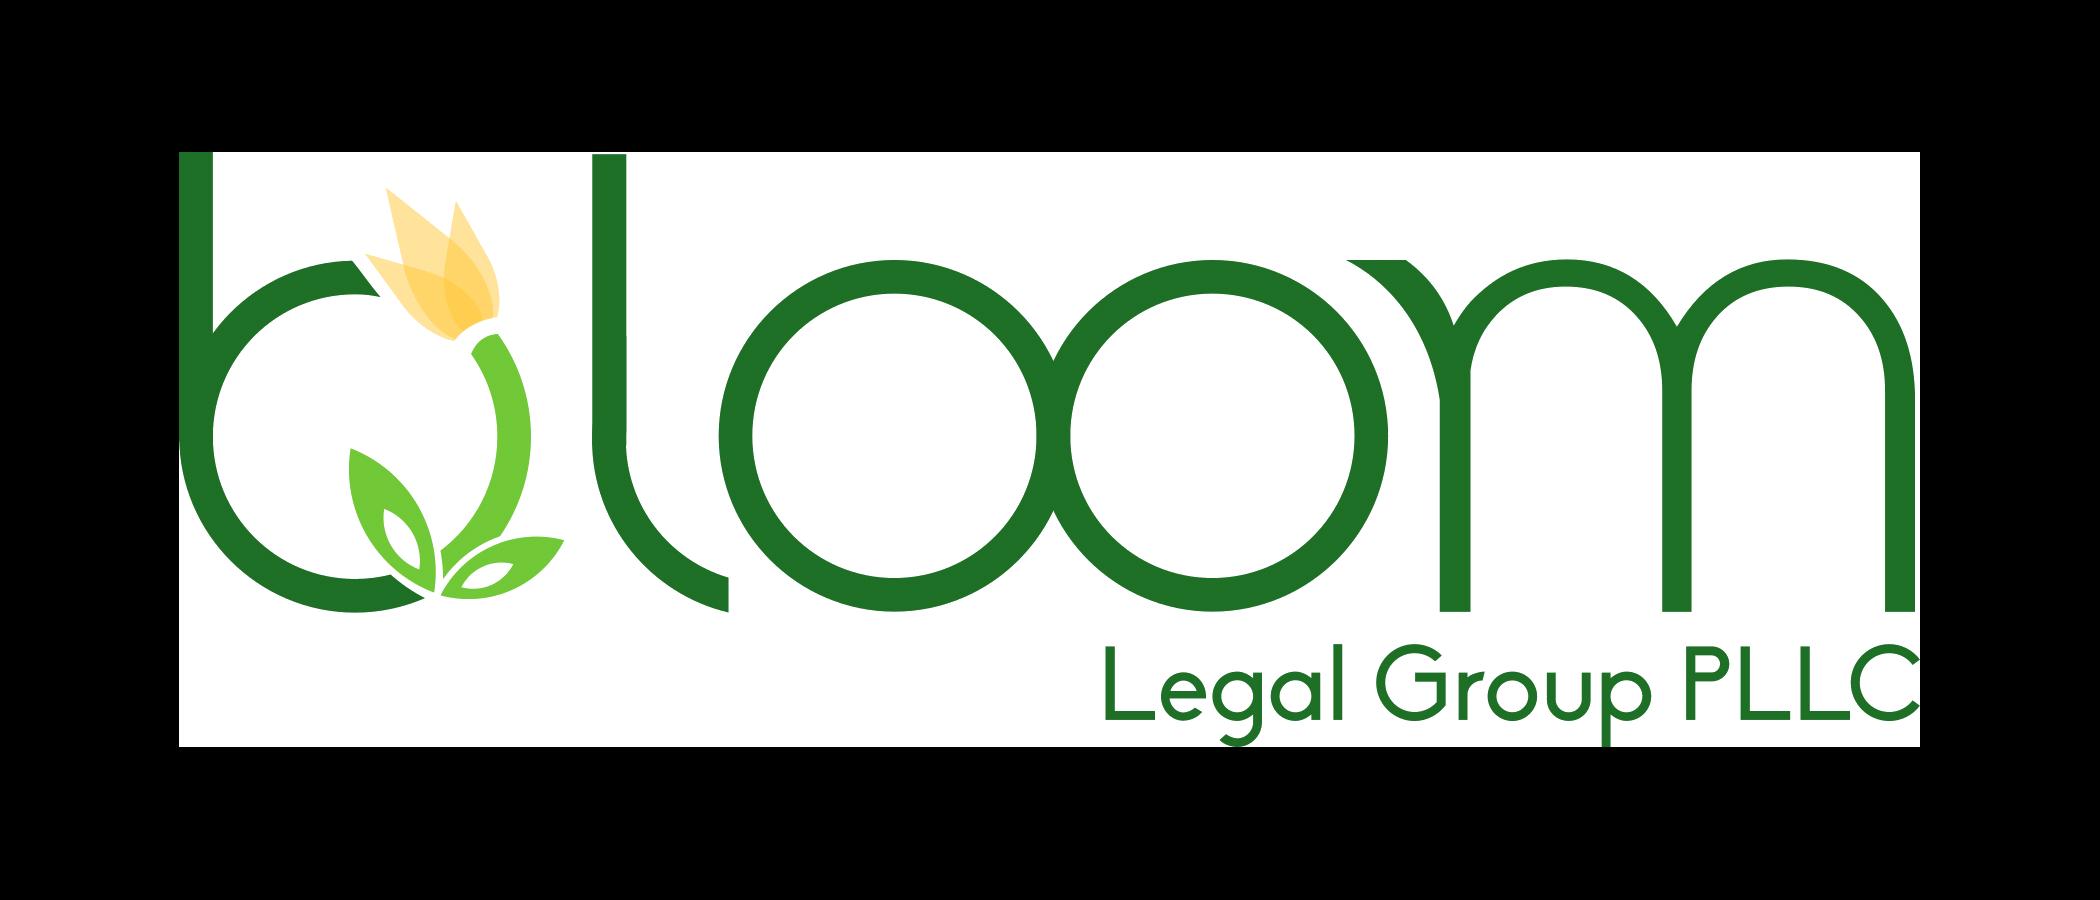 Bloom Legal Group PLLC